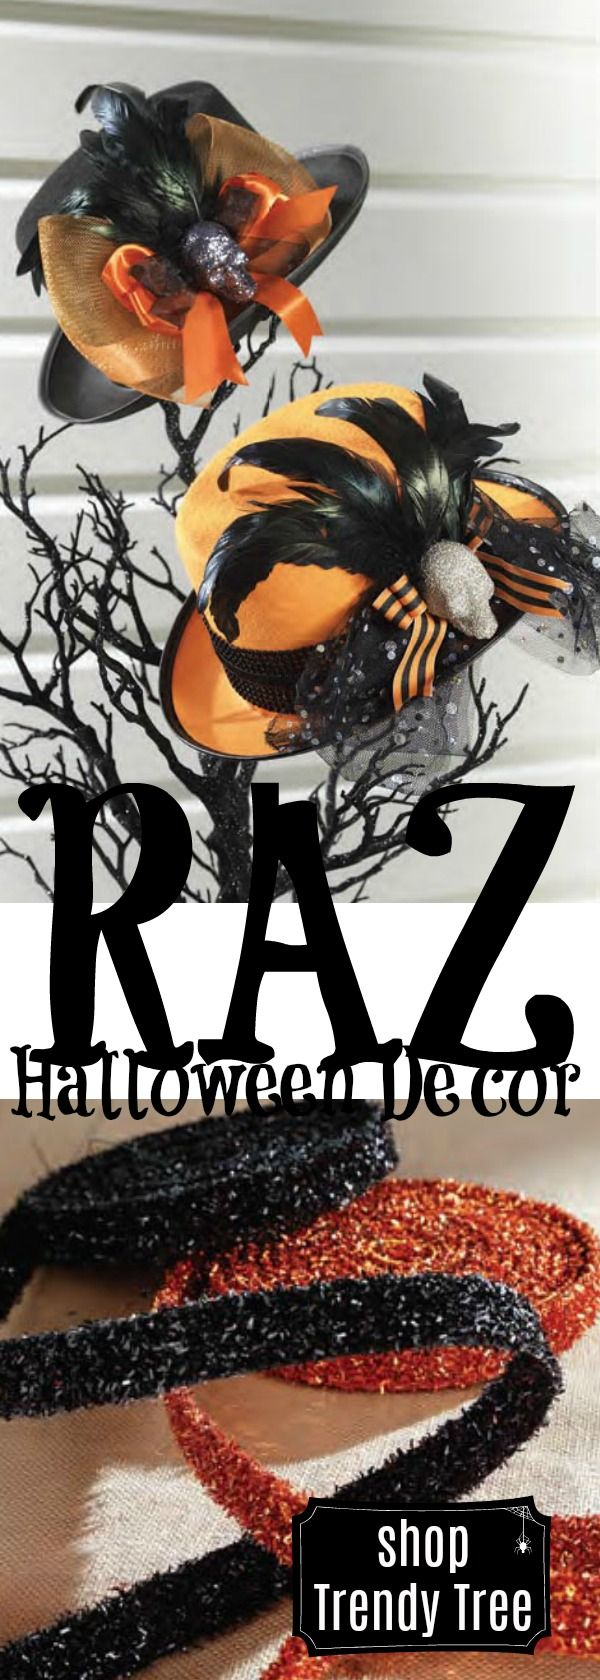 Shop Trendy Tree for fantastic RAZ Halloween decorations! #TrendyTree #halloween #raz